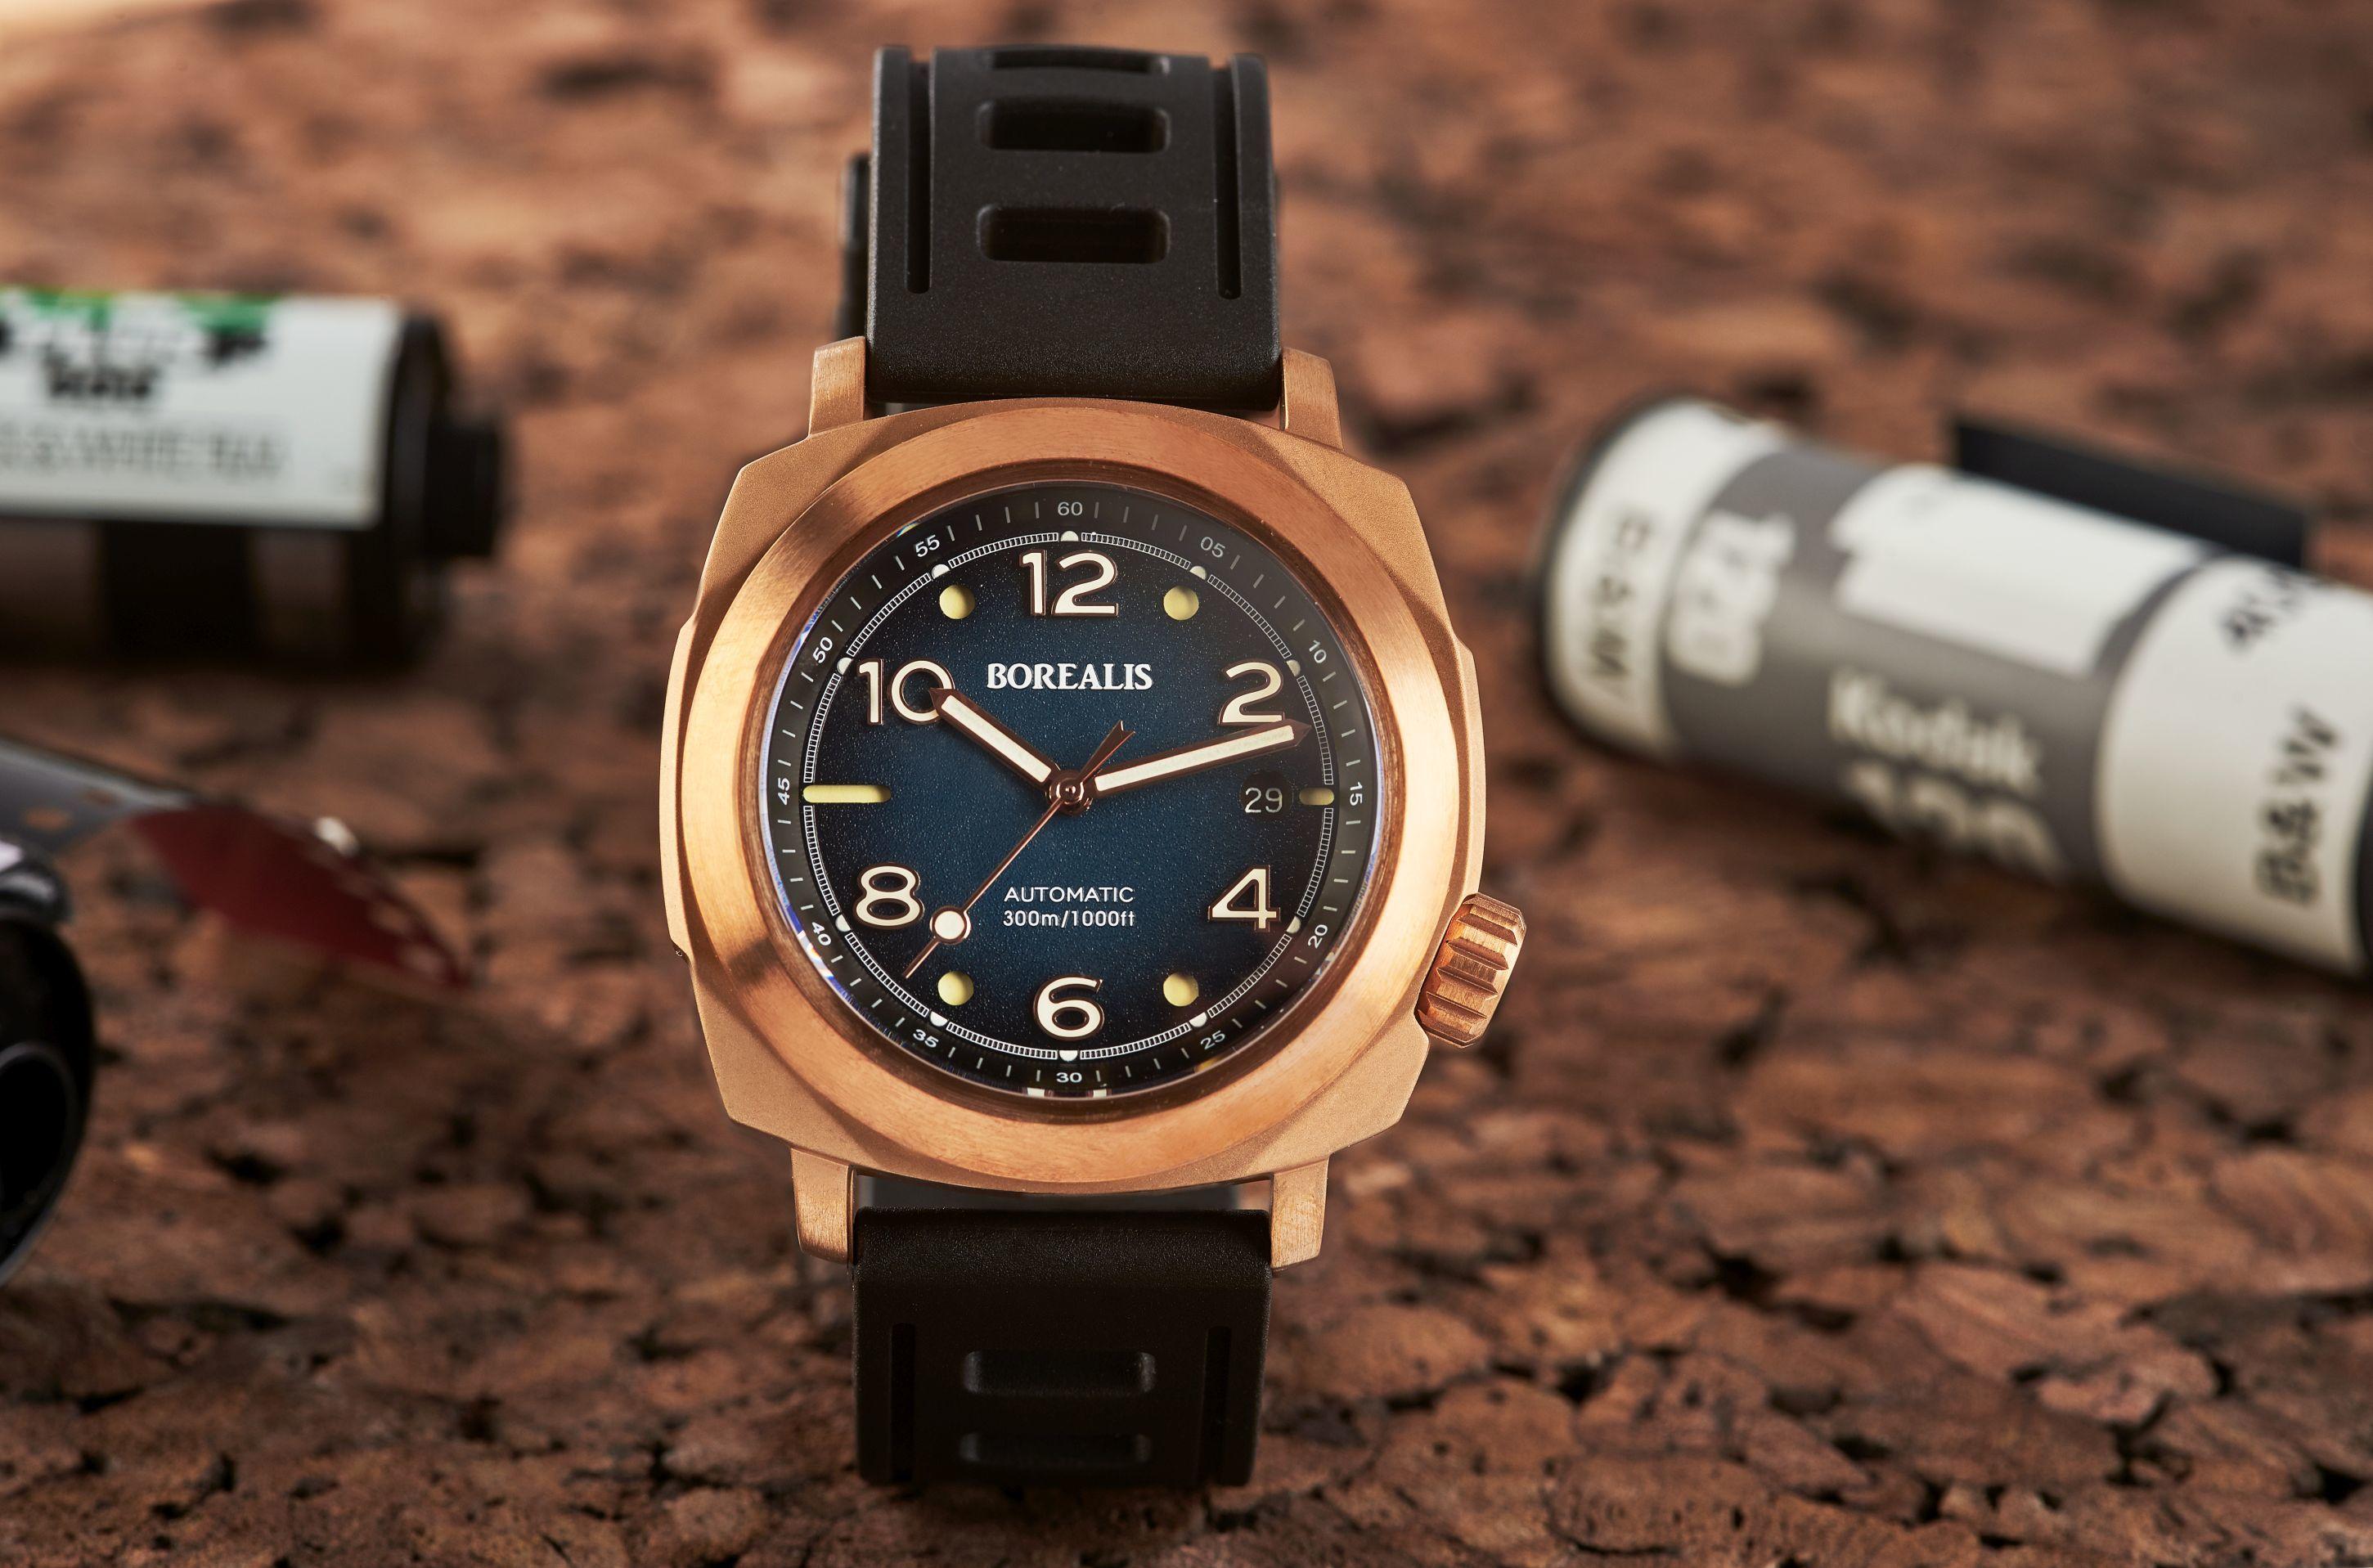 Borealis Navale CuSn8 Bronze 300m Diver Watch Miyota 9015 Fumed Blue Version CF Fixed Bezel BNAVALECFBLUE